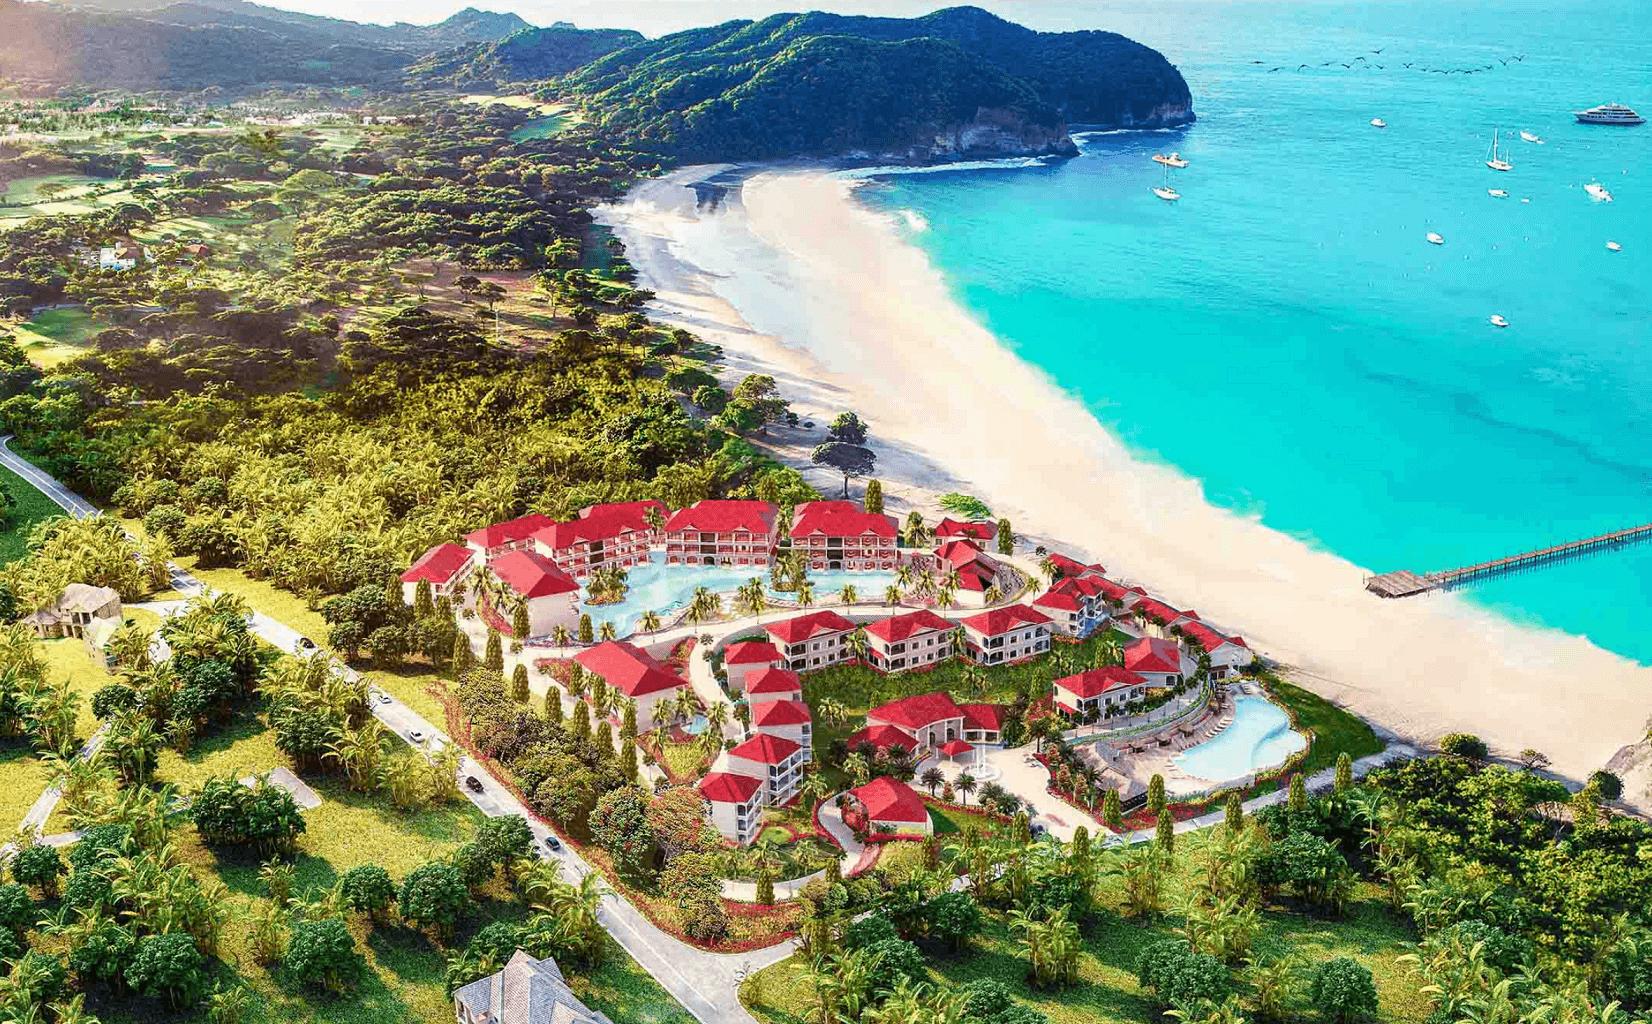 Silver Beach Resort Topview